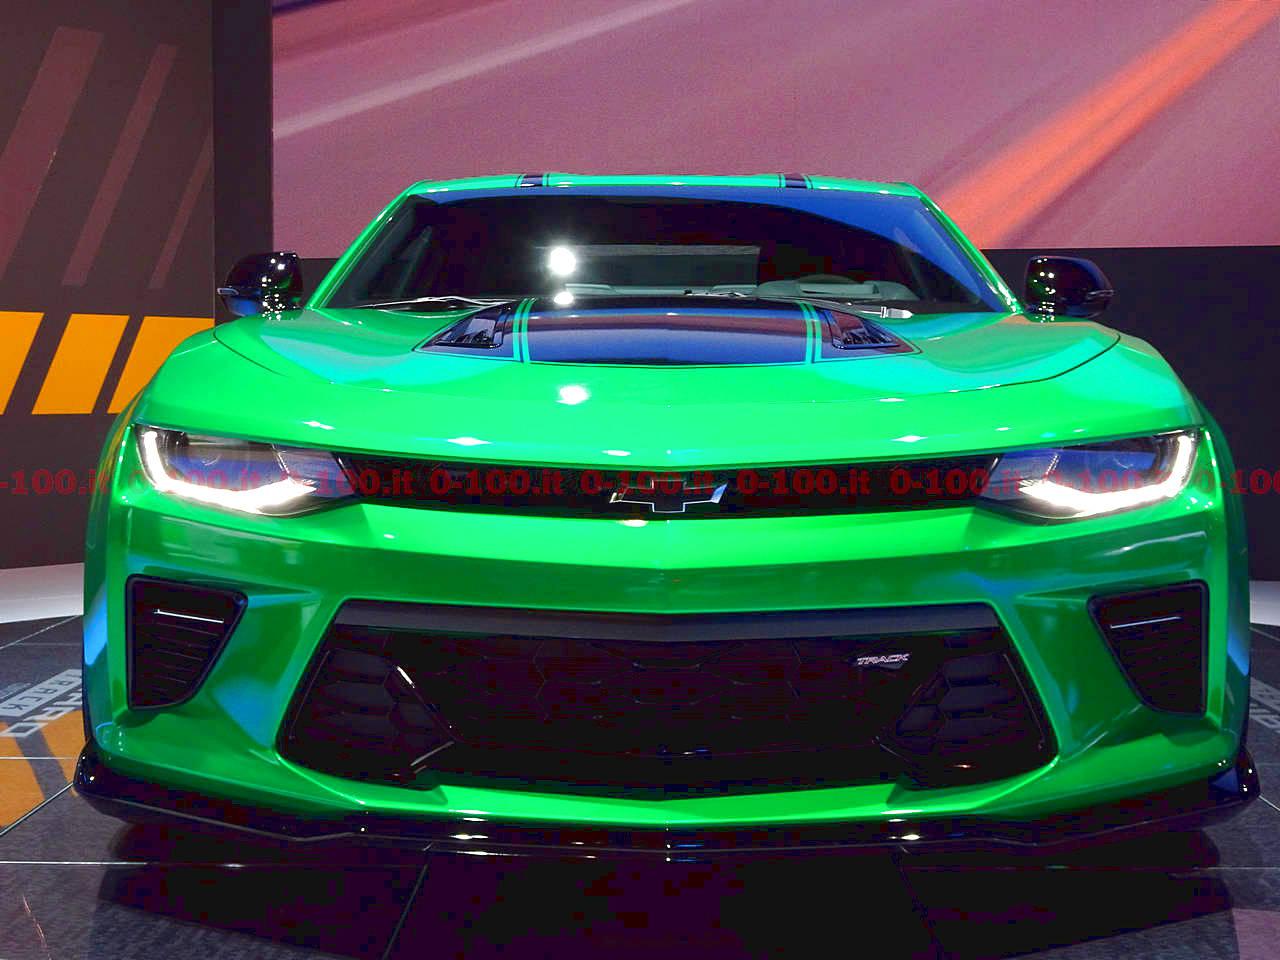 Ginevra-geneva-geneve-2017-Chevrolet-Camaro-Track-Concept-0-100_9